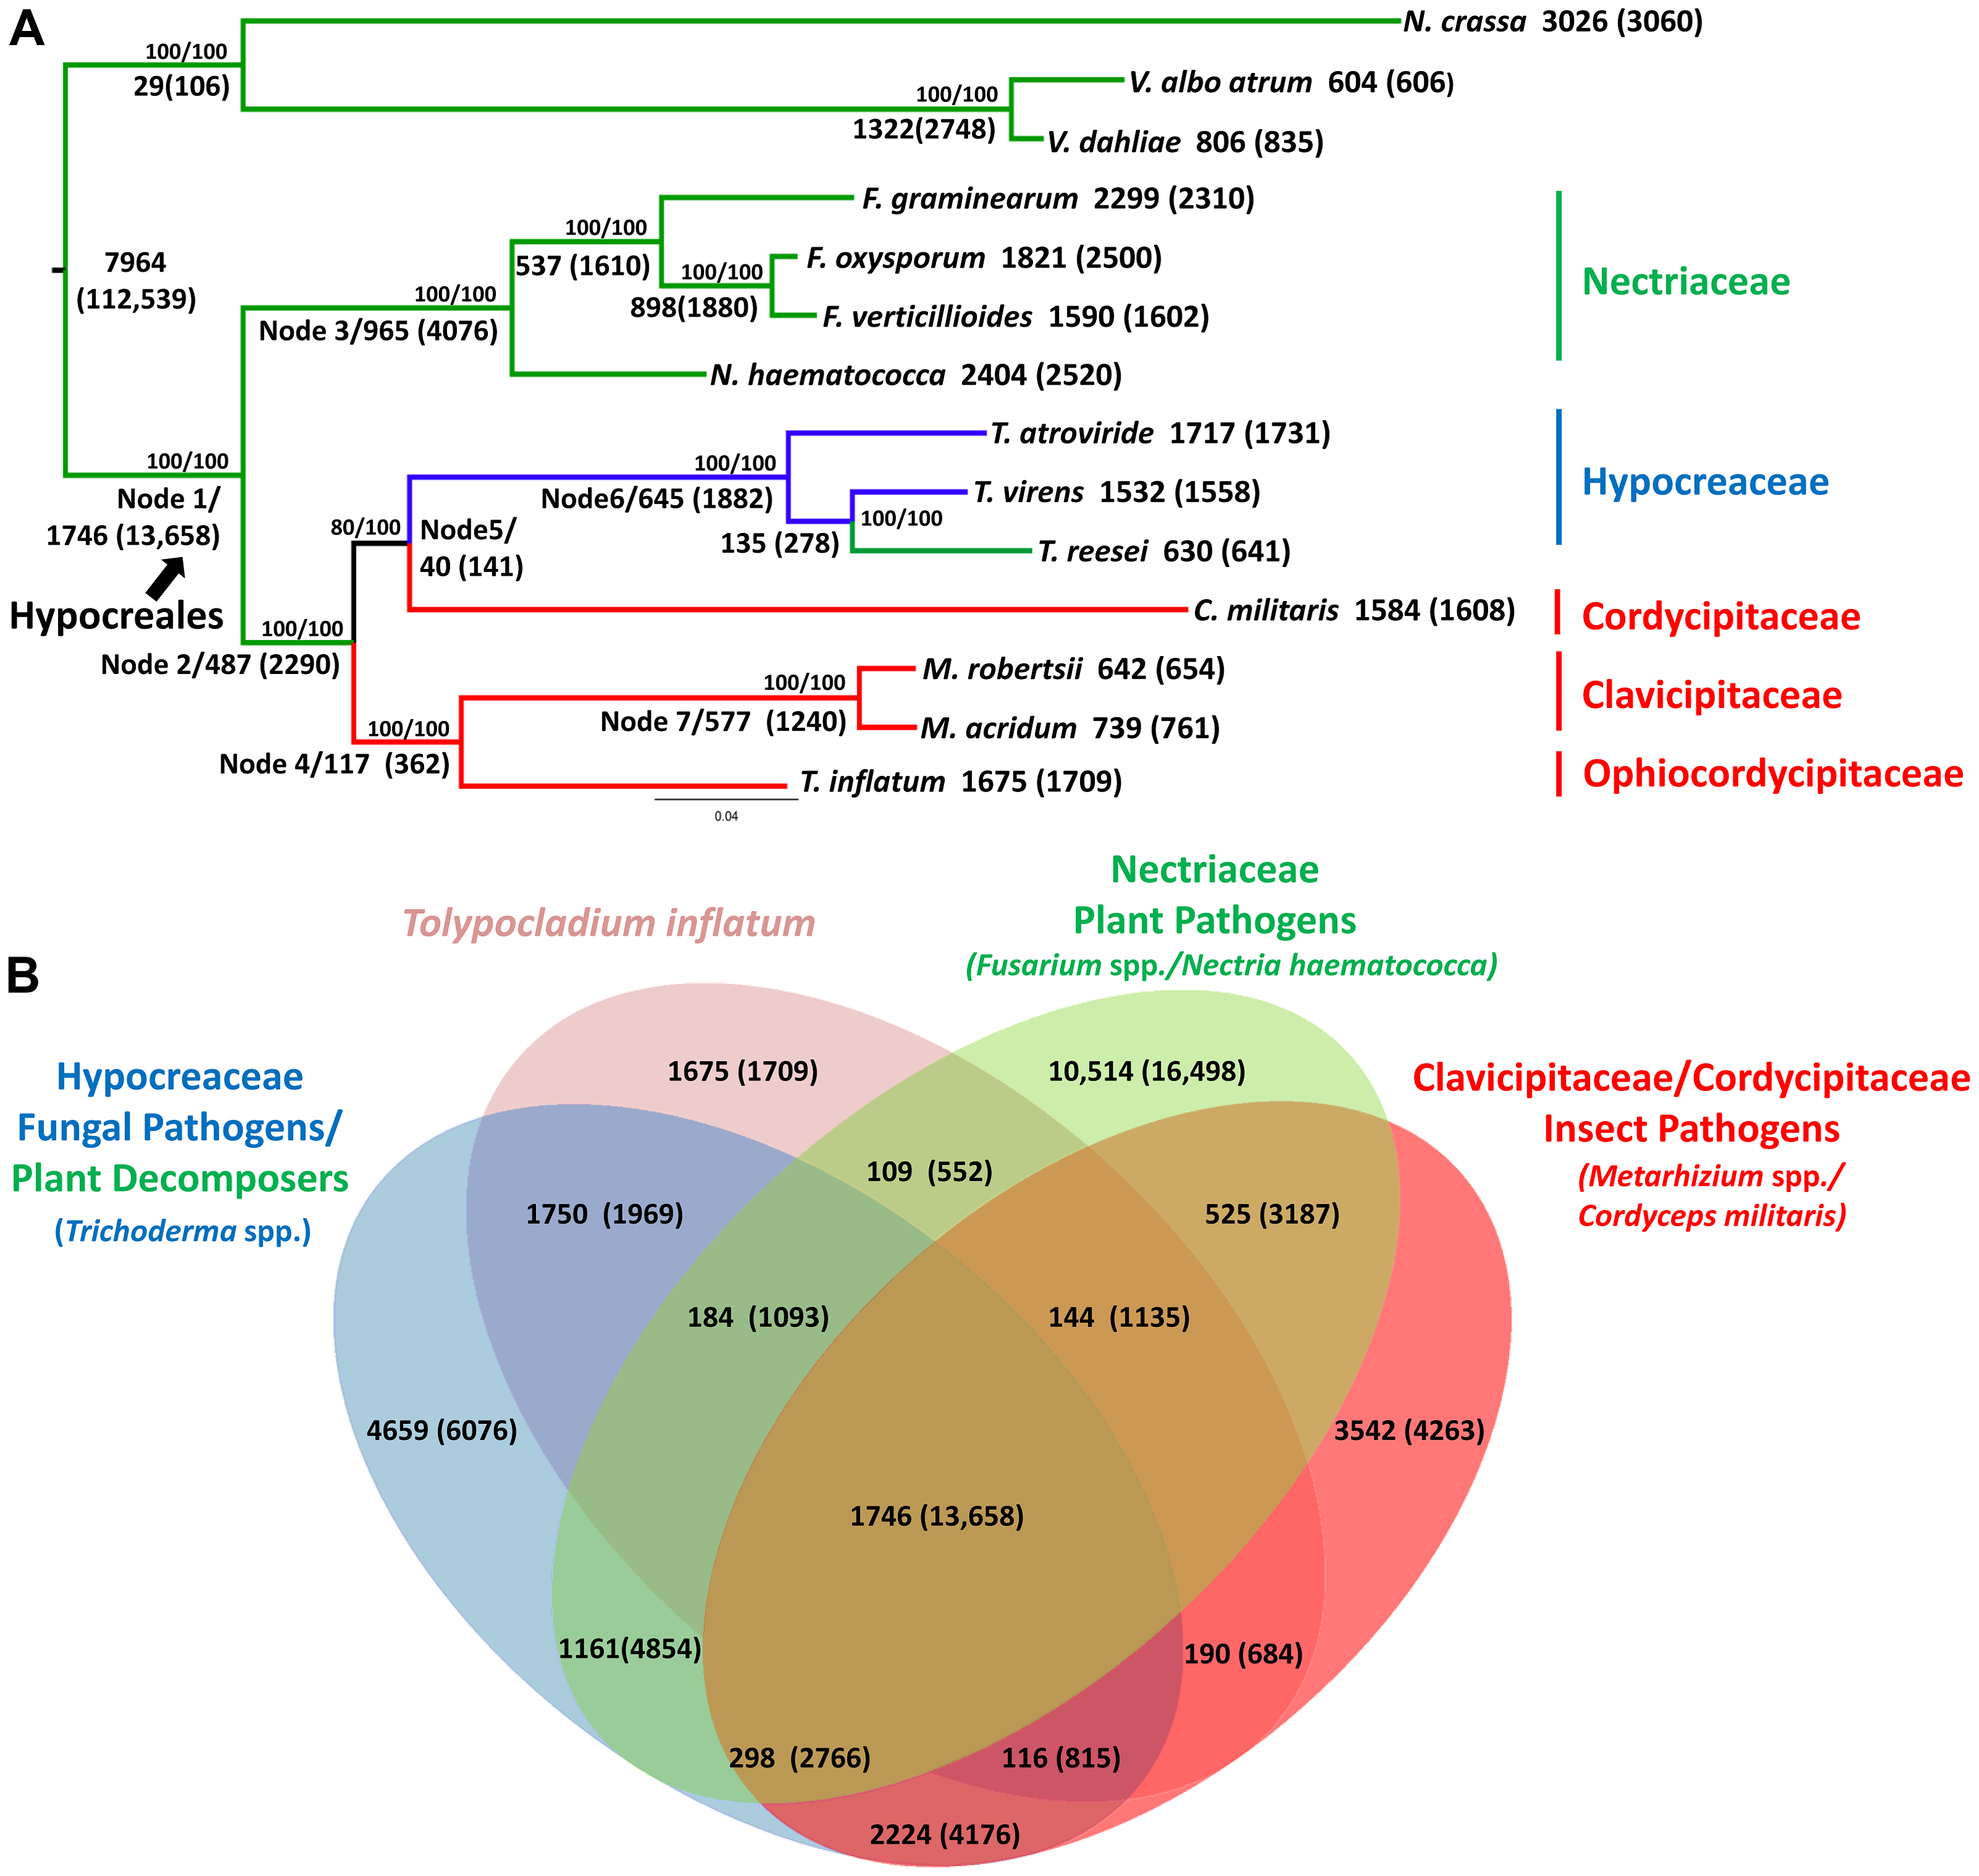 Phylogenetic relationships and orthologous gene clusters.